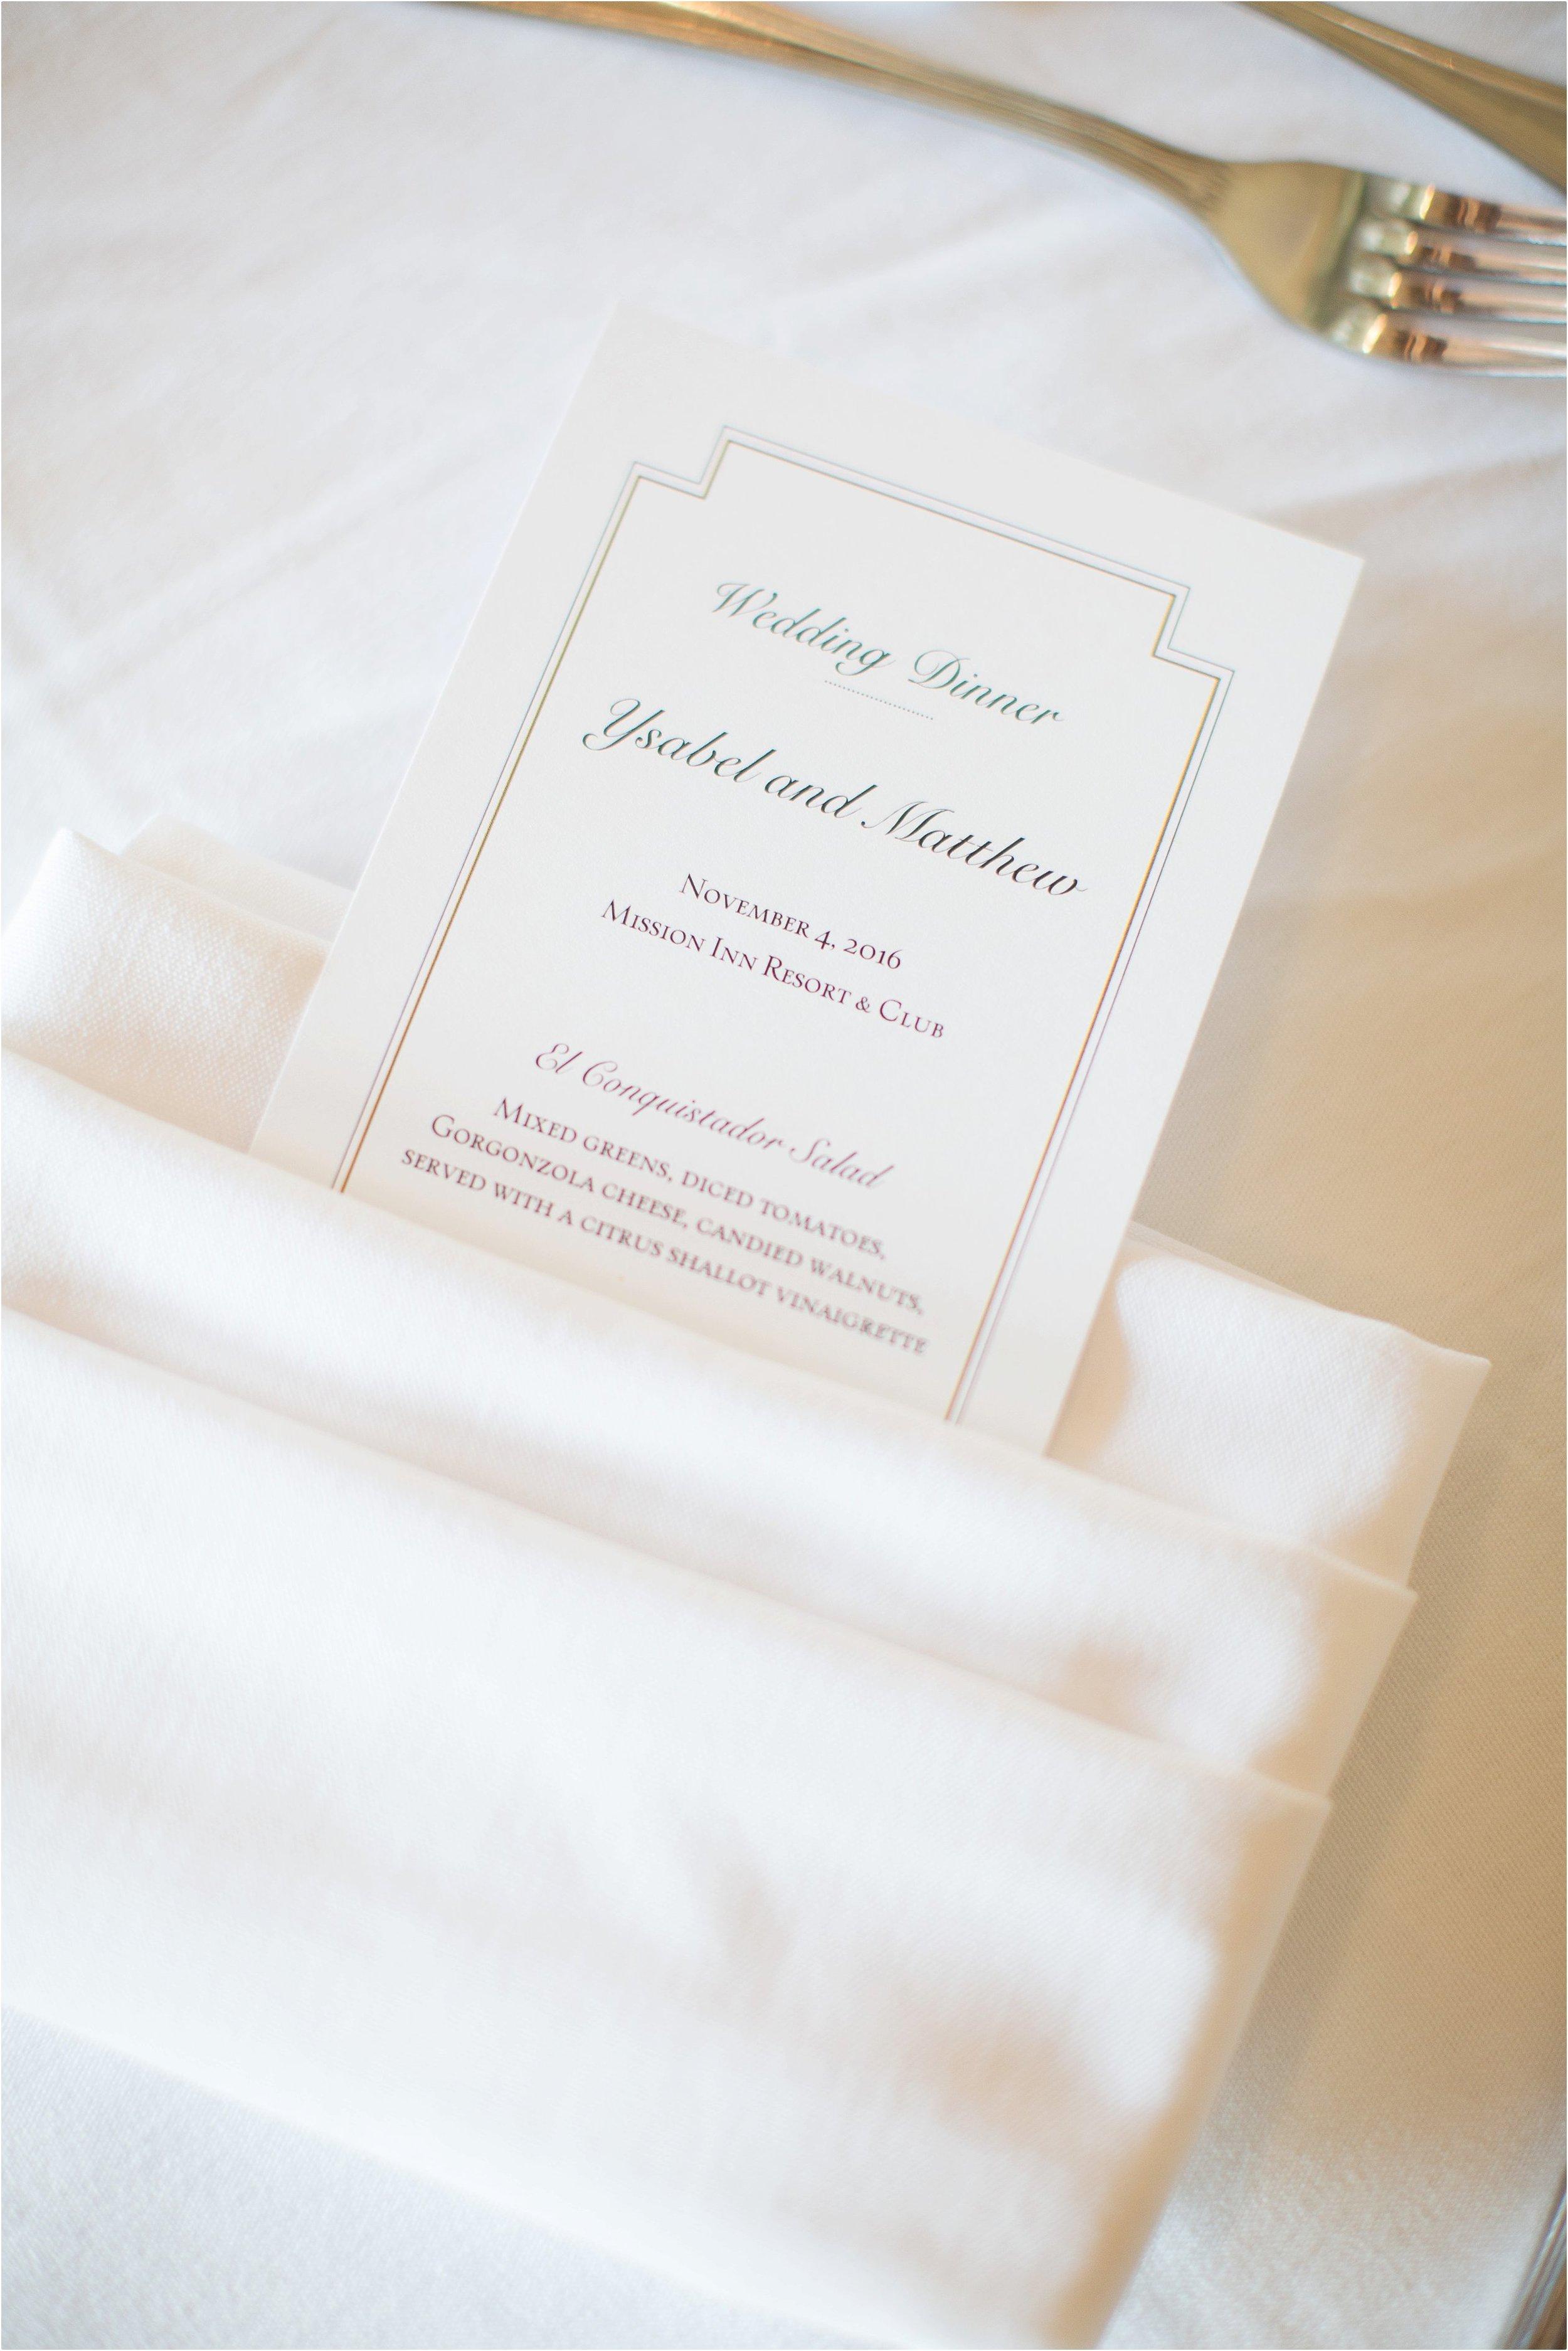 Lovely napkin details at reception at Mission Inn Wedding